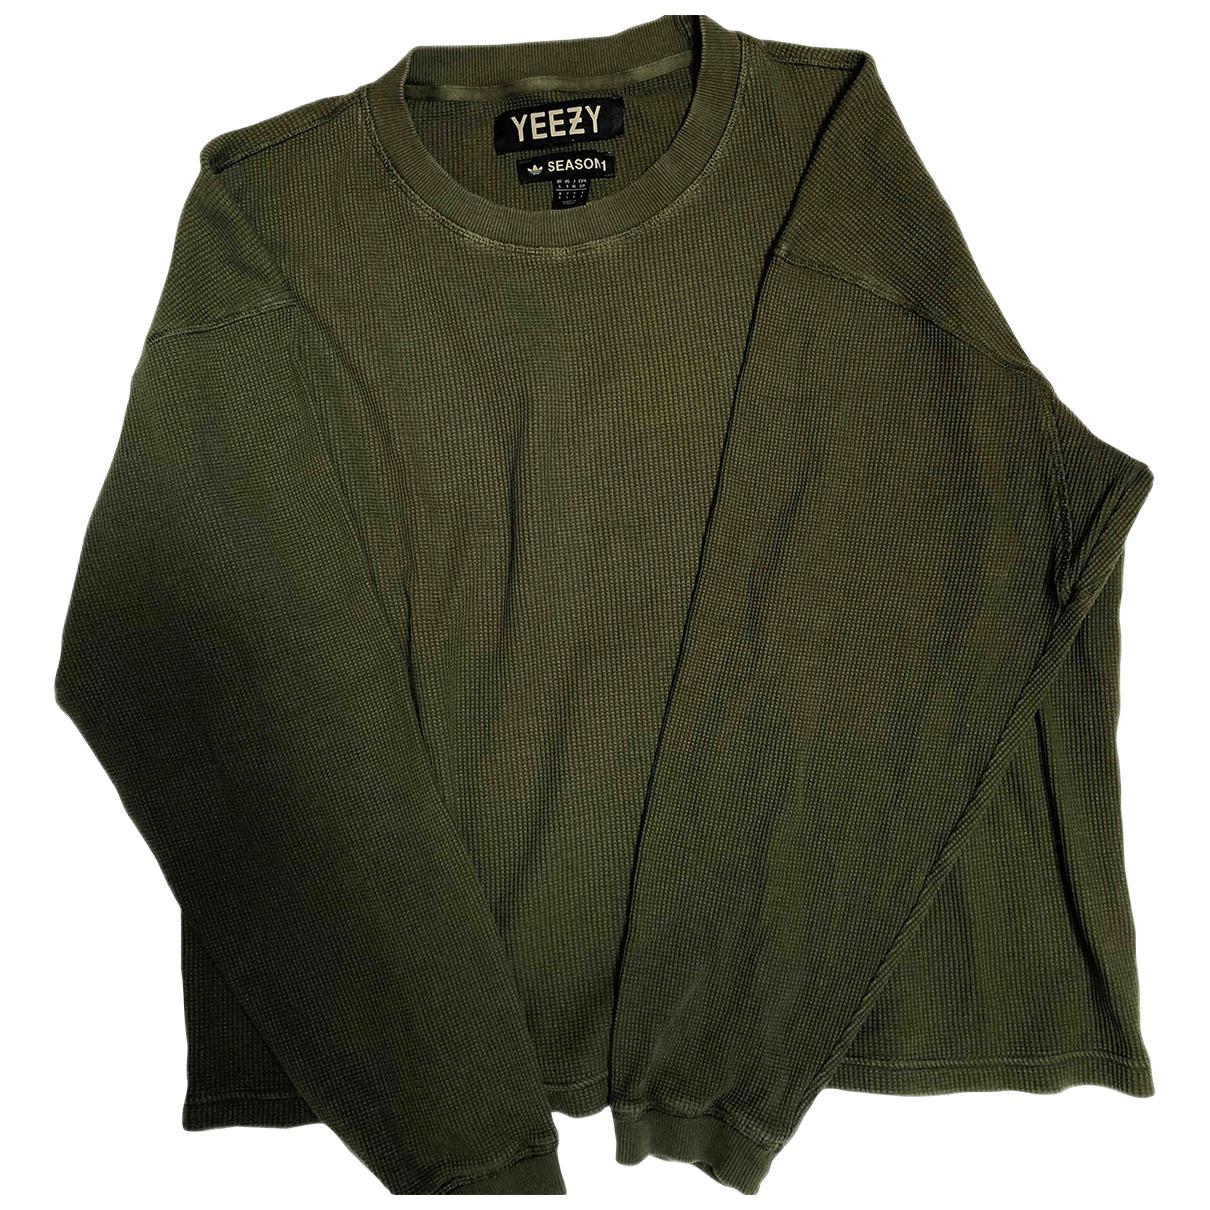 Yeezy X Adidas - Tee shirts   pour homme en coton - vert